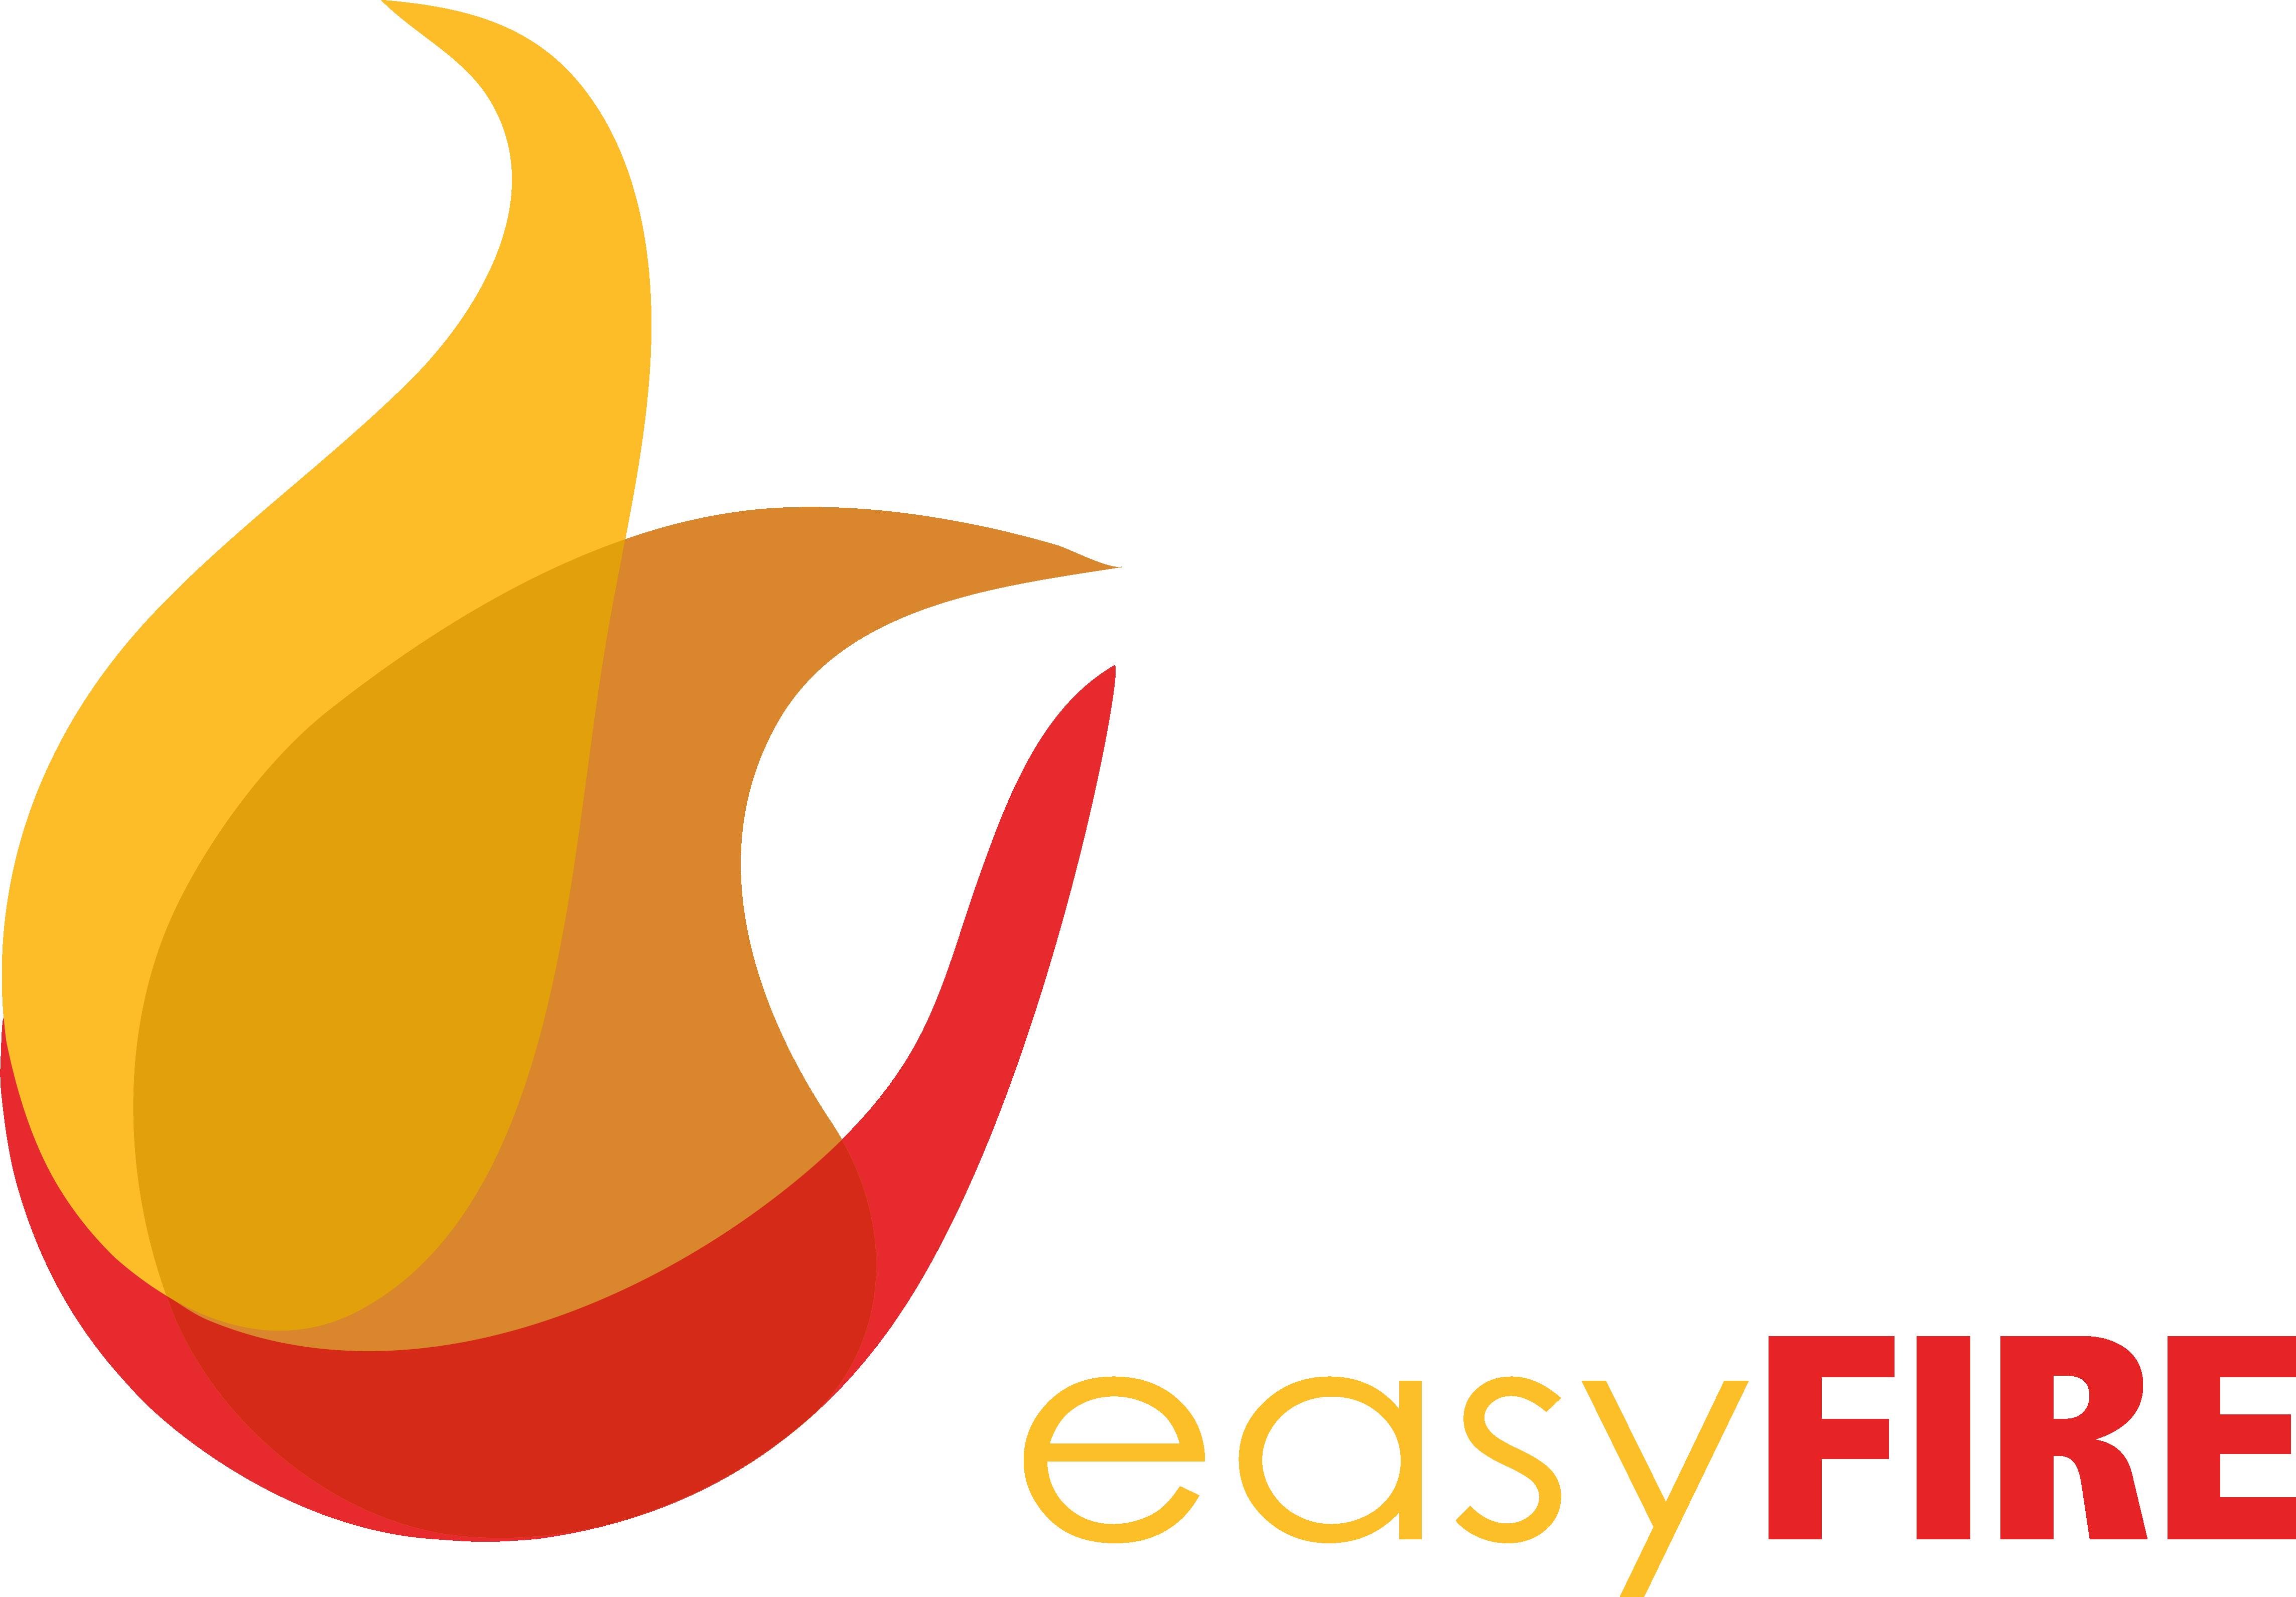 Easy Fire